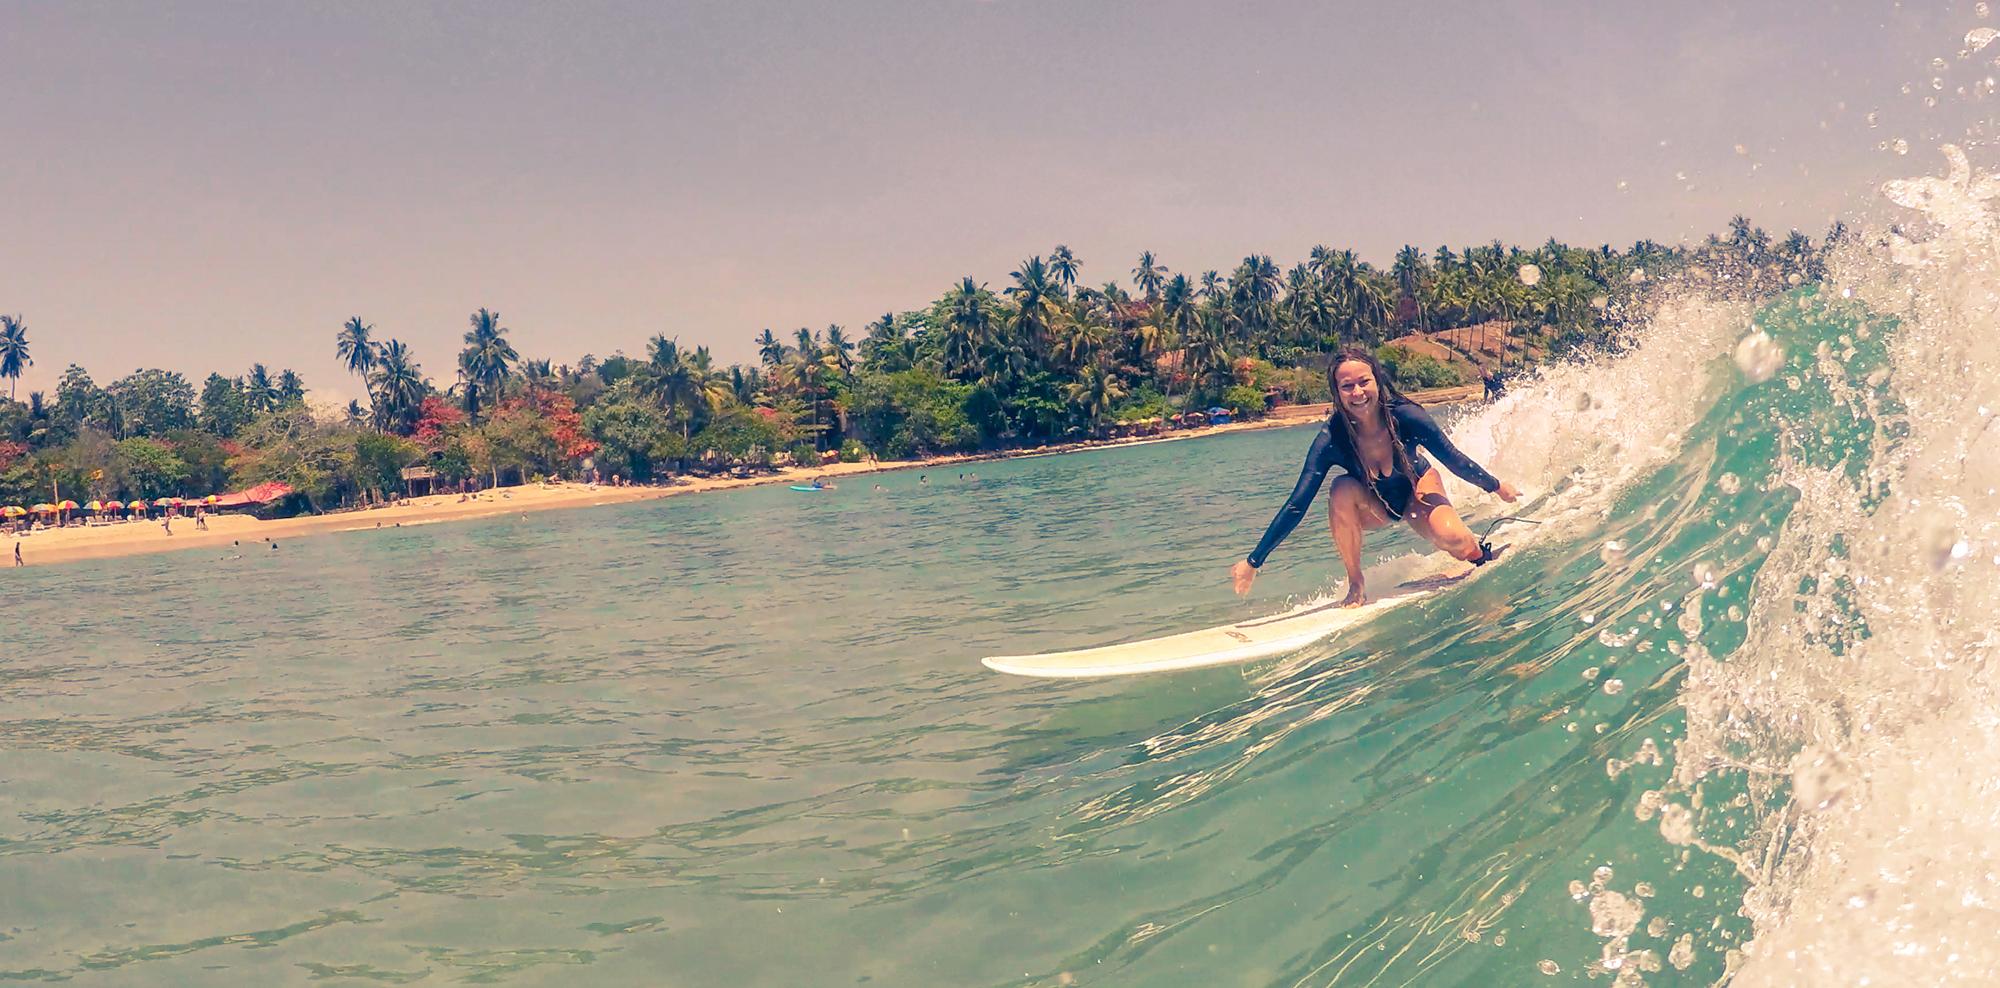 surfing-new-years-yoga-retreat-retreats-mexico.jpg